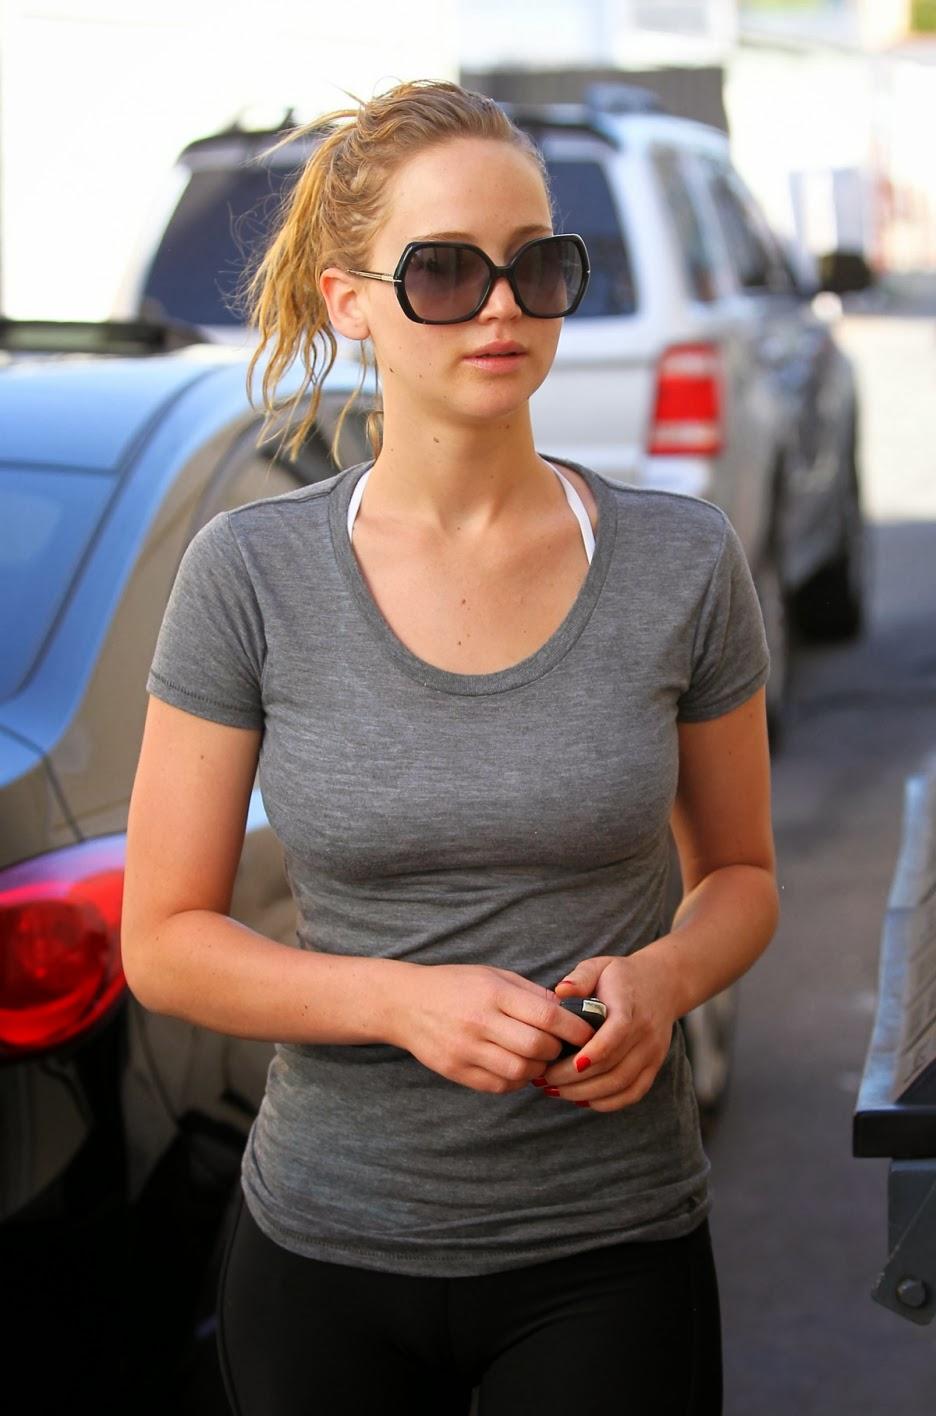 Latest Celebrity Photos Jennifer Lawrence Sexy And Hot -1027